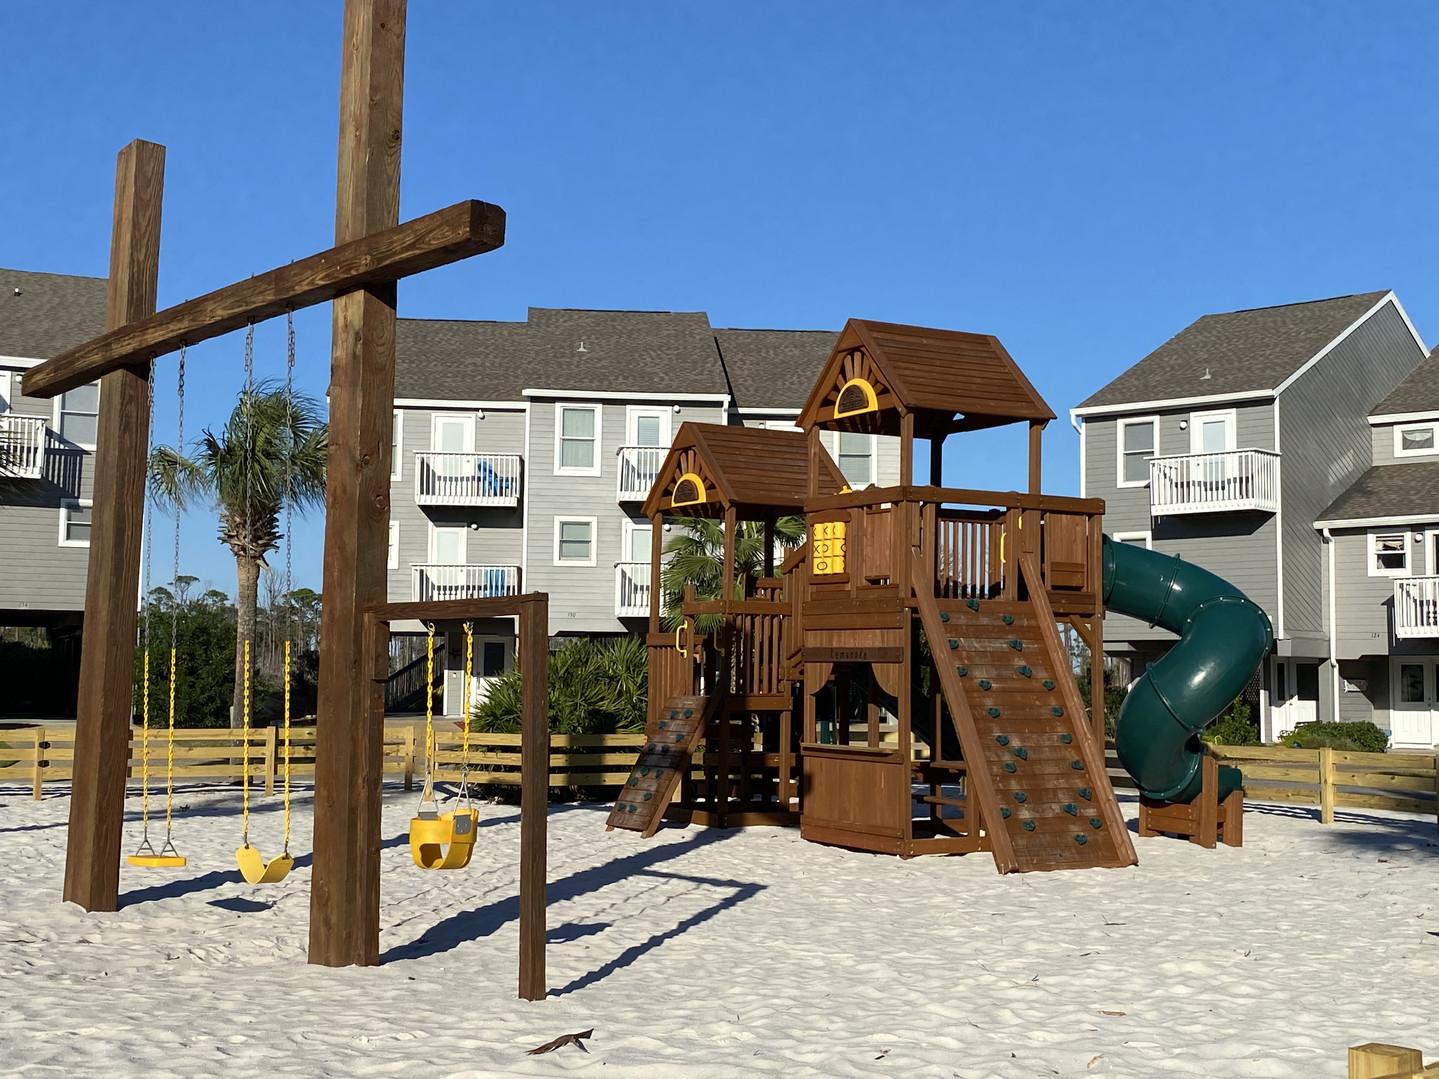 Fantastic playground